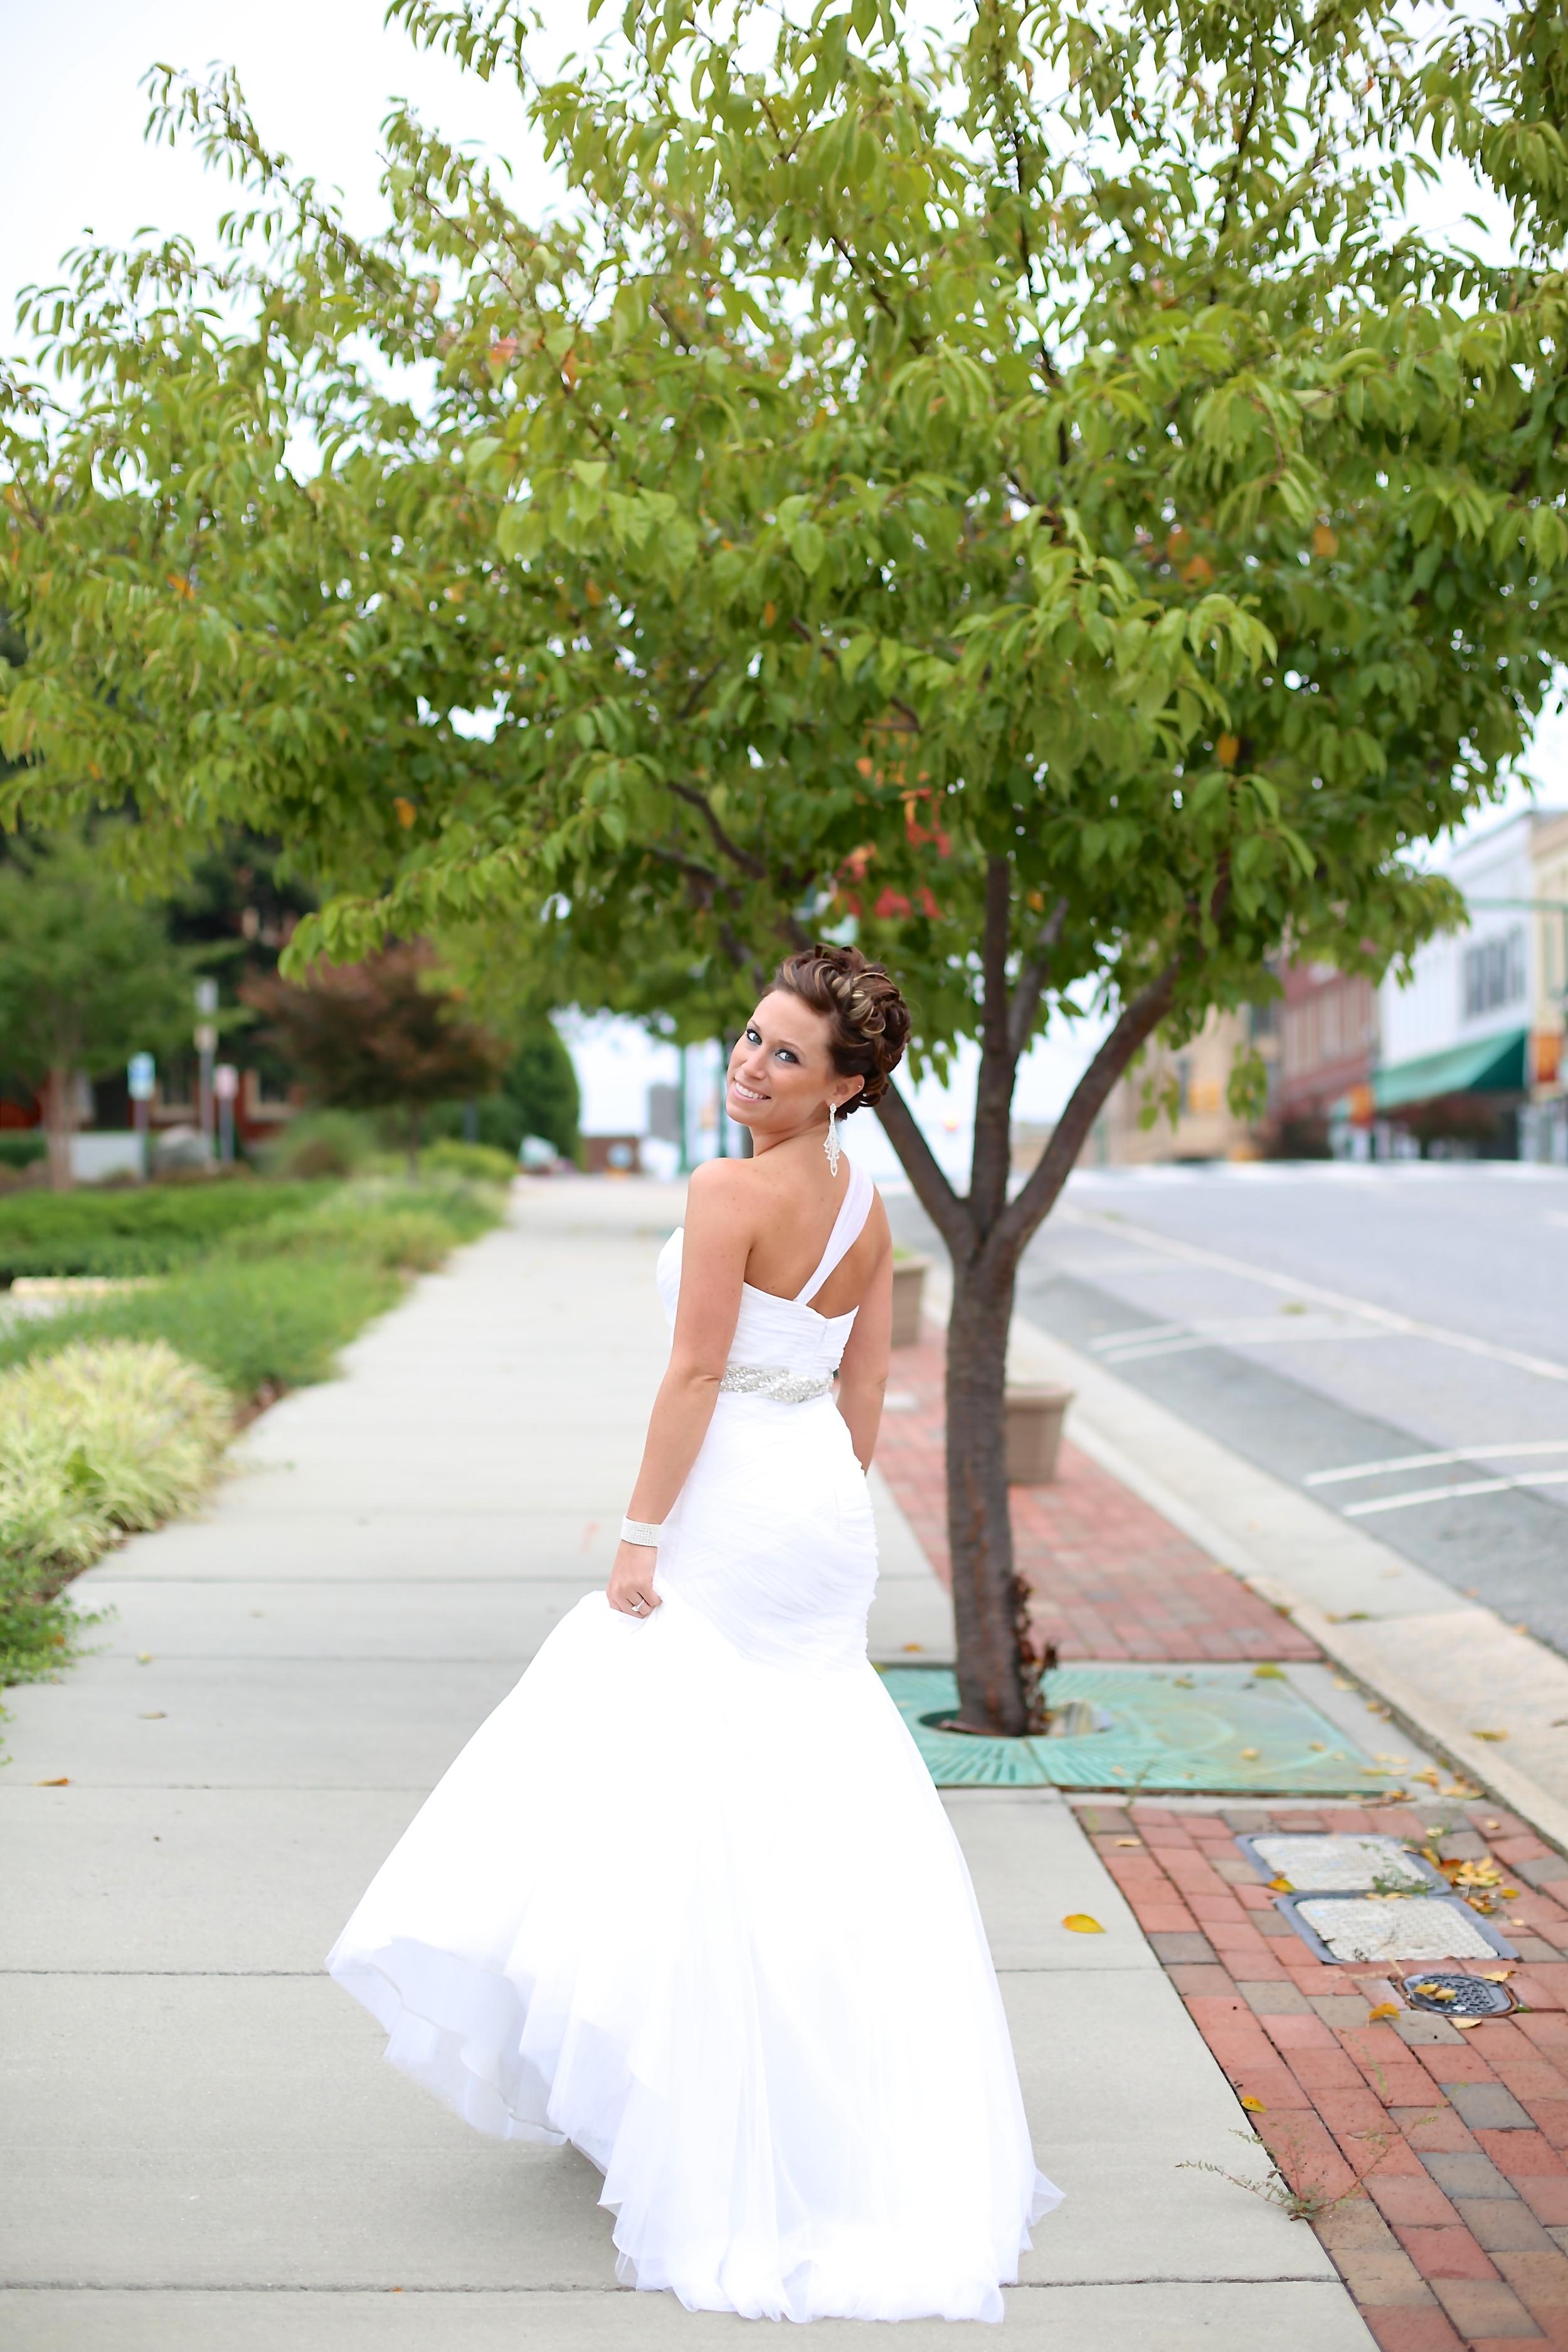 joanna bridal shoot 17